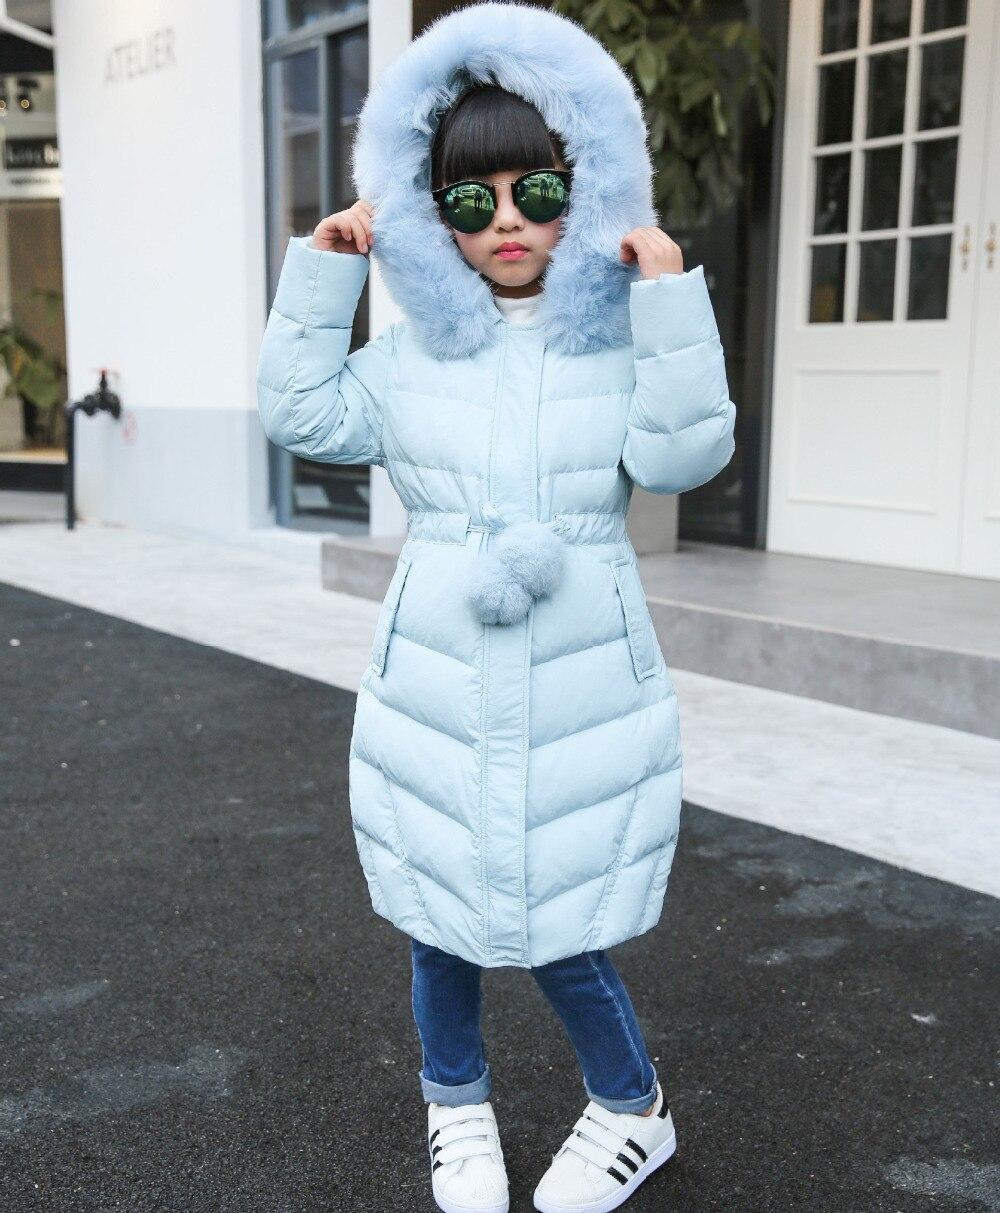 New 2017 girl jacket fur hooded long coat kids big girl thick overcoat casual fashion outwear solid classic clohing girl garmet christmas long hooded jacket girl 90